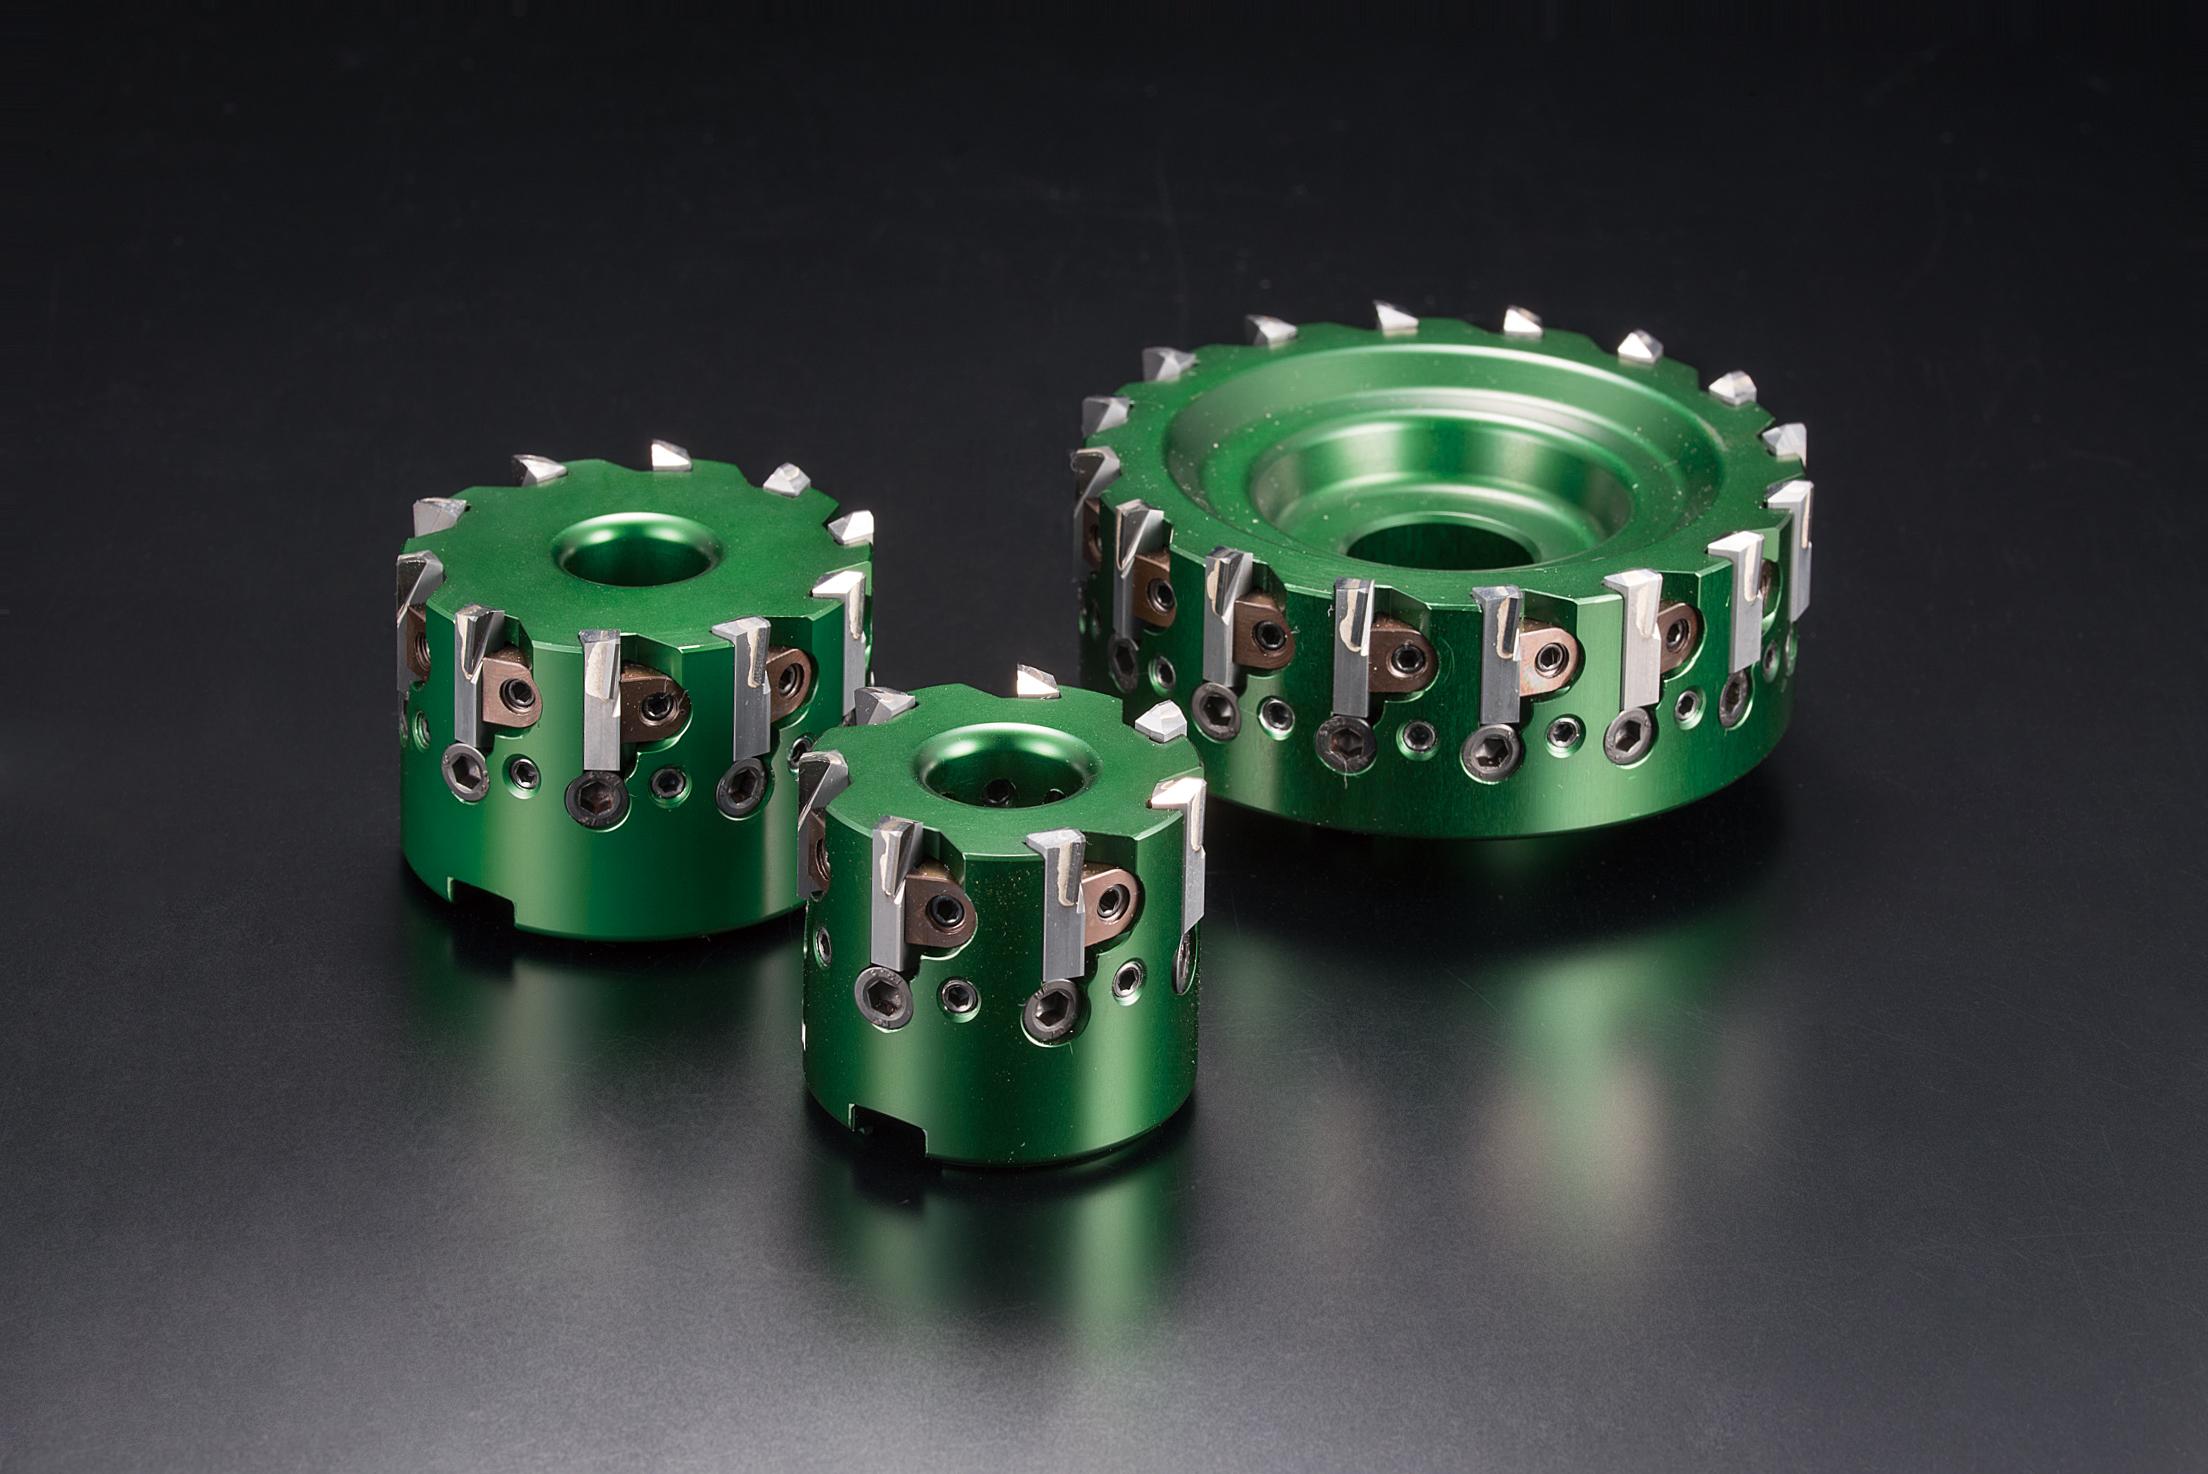 Machining Heat Resistant Super Alloys At High Speeds